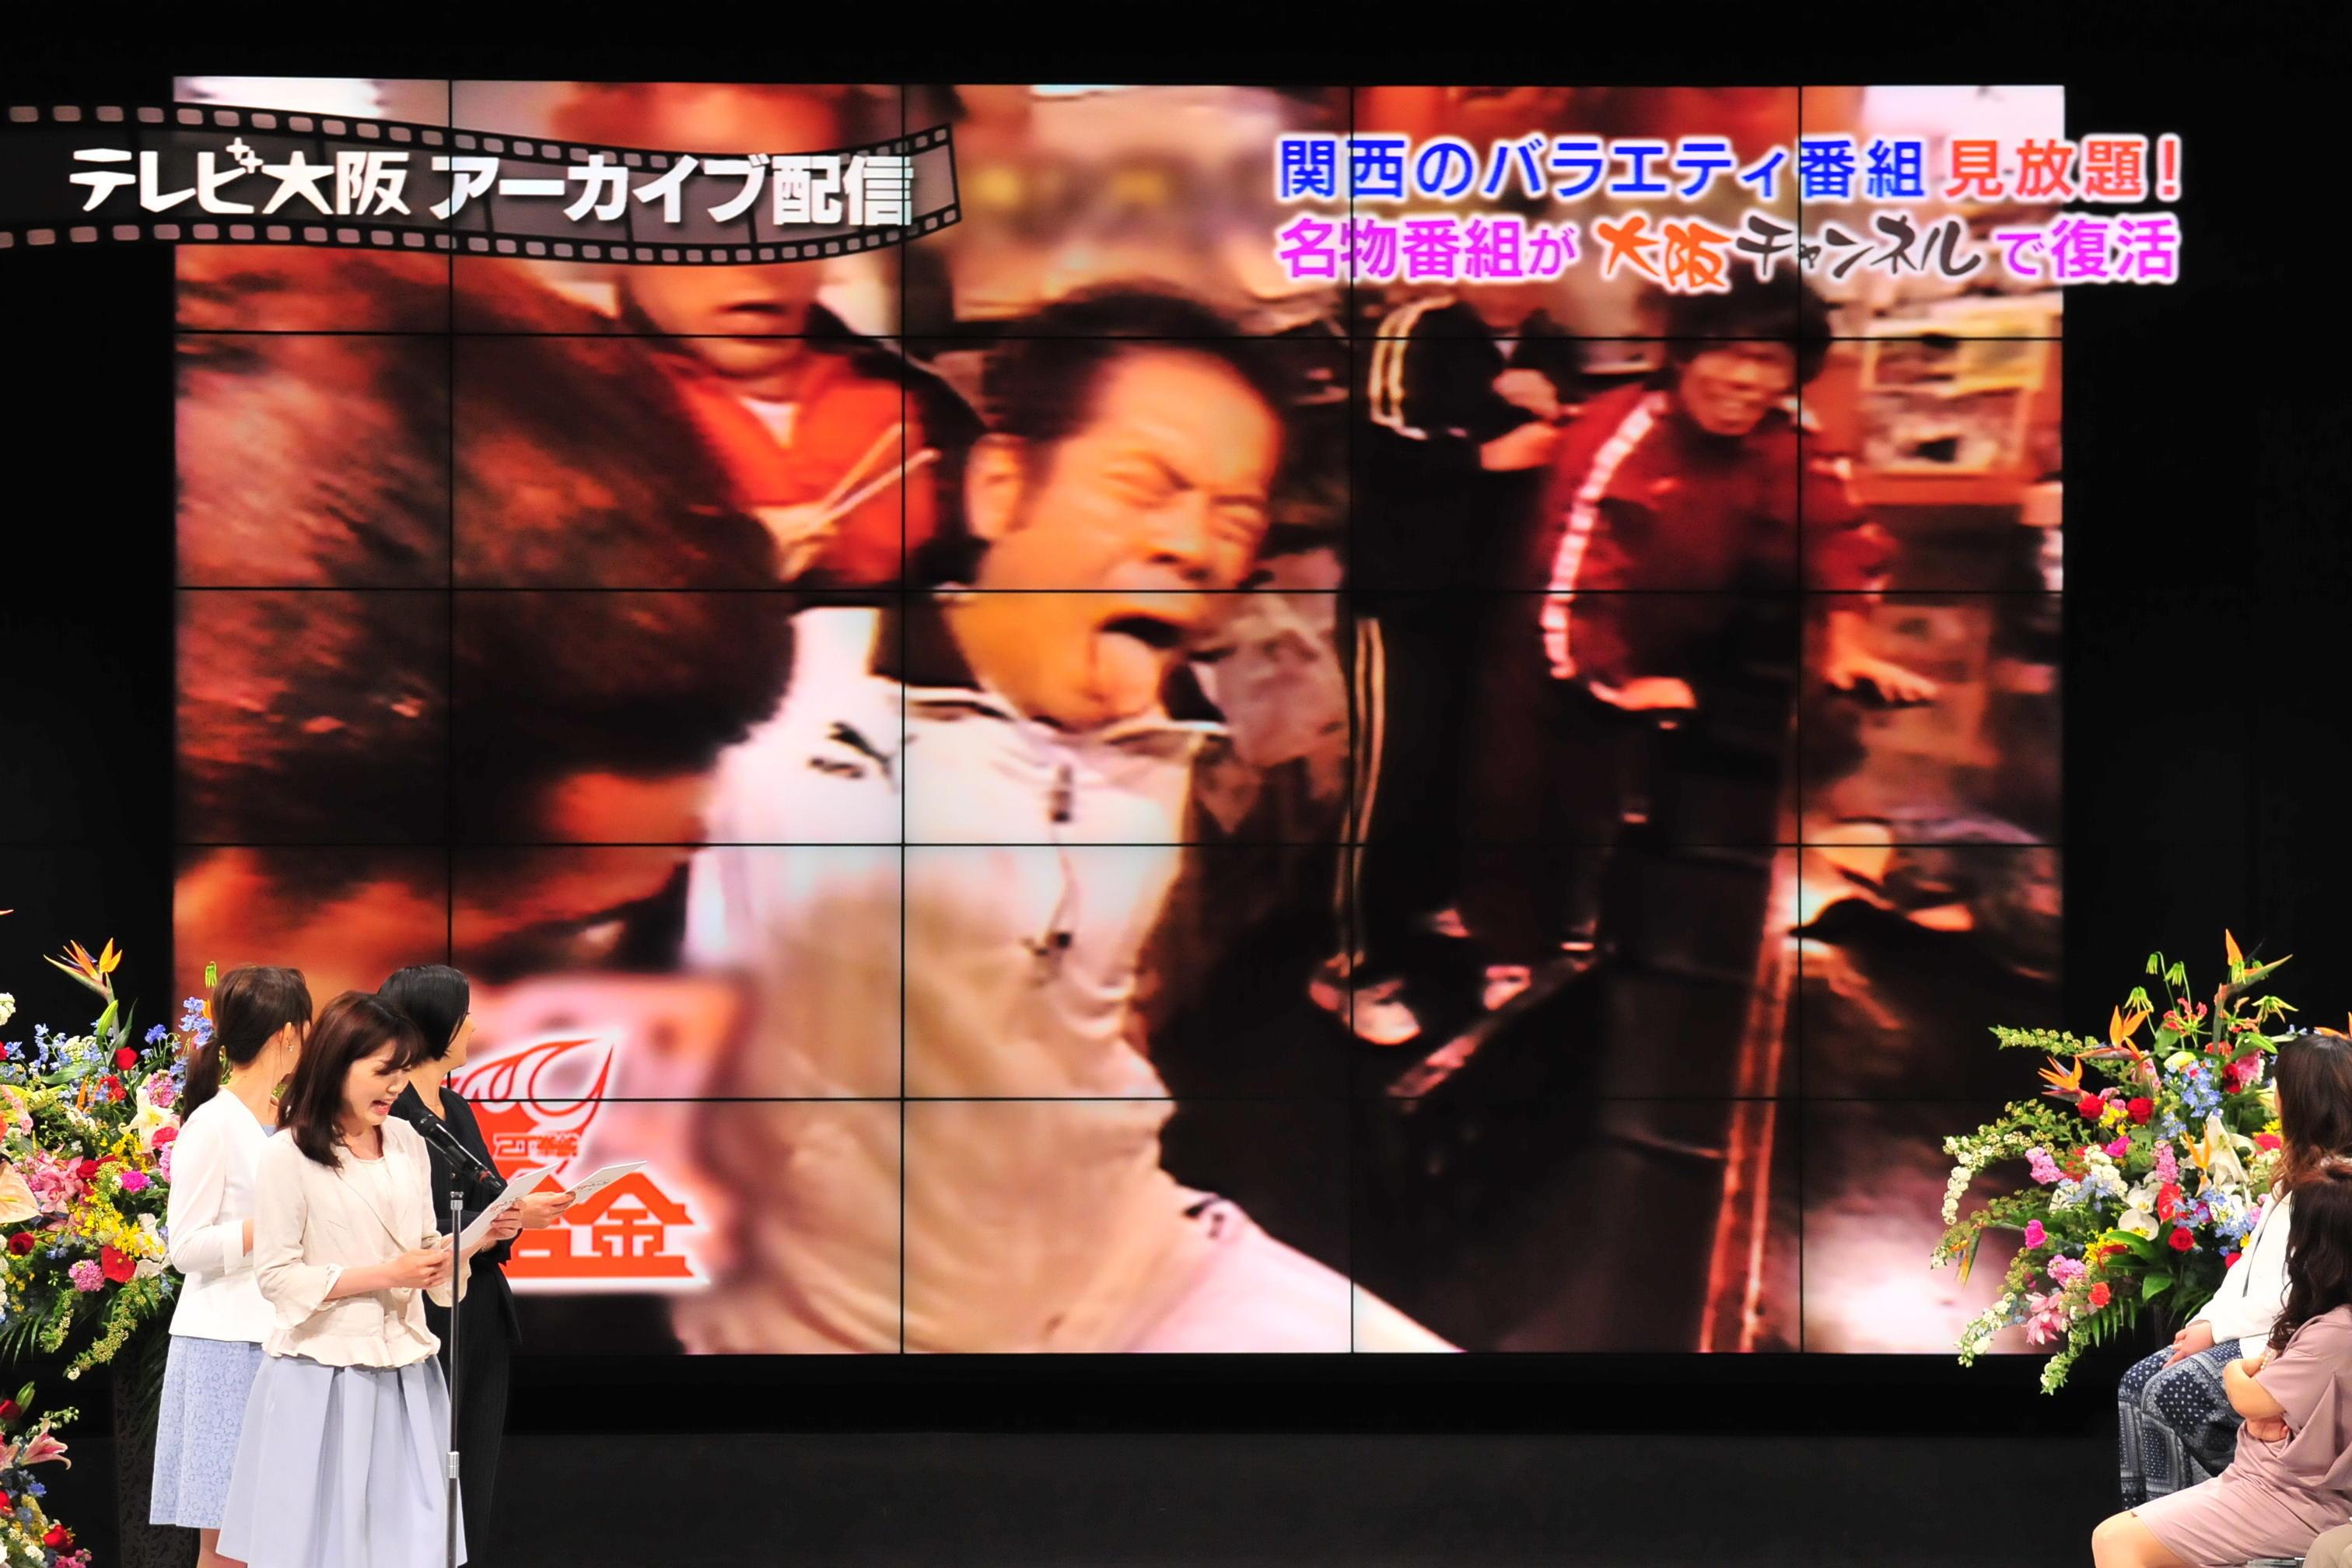 http://news.yoshimoto.co.jp/20170425160543-1f2f74c87da5867eb76947eaa93dbf4a9ea93a0f.jpg